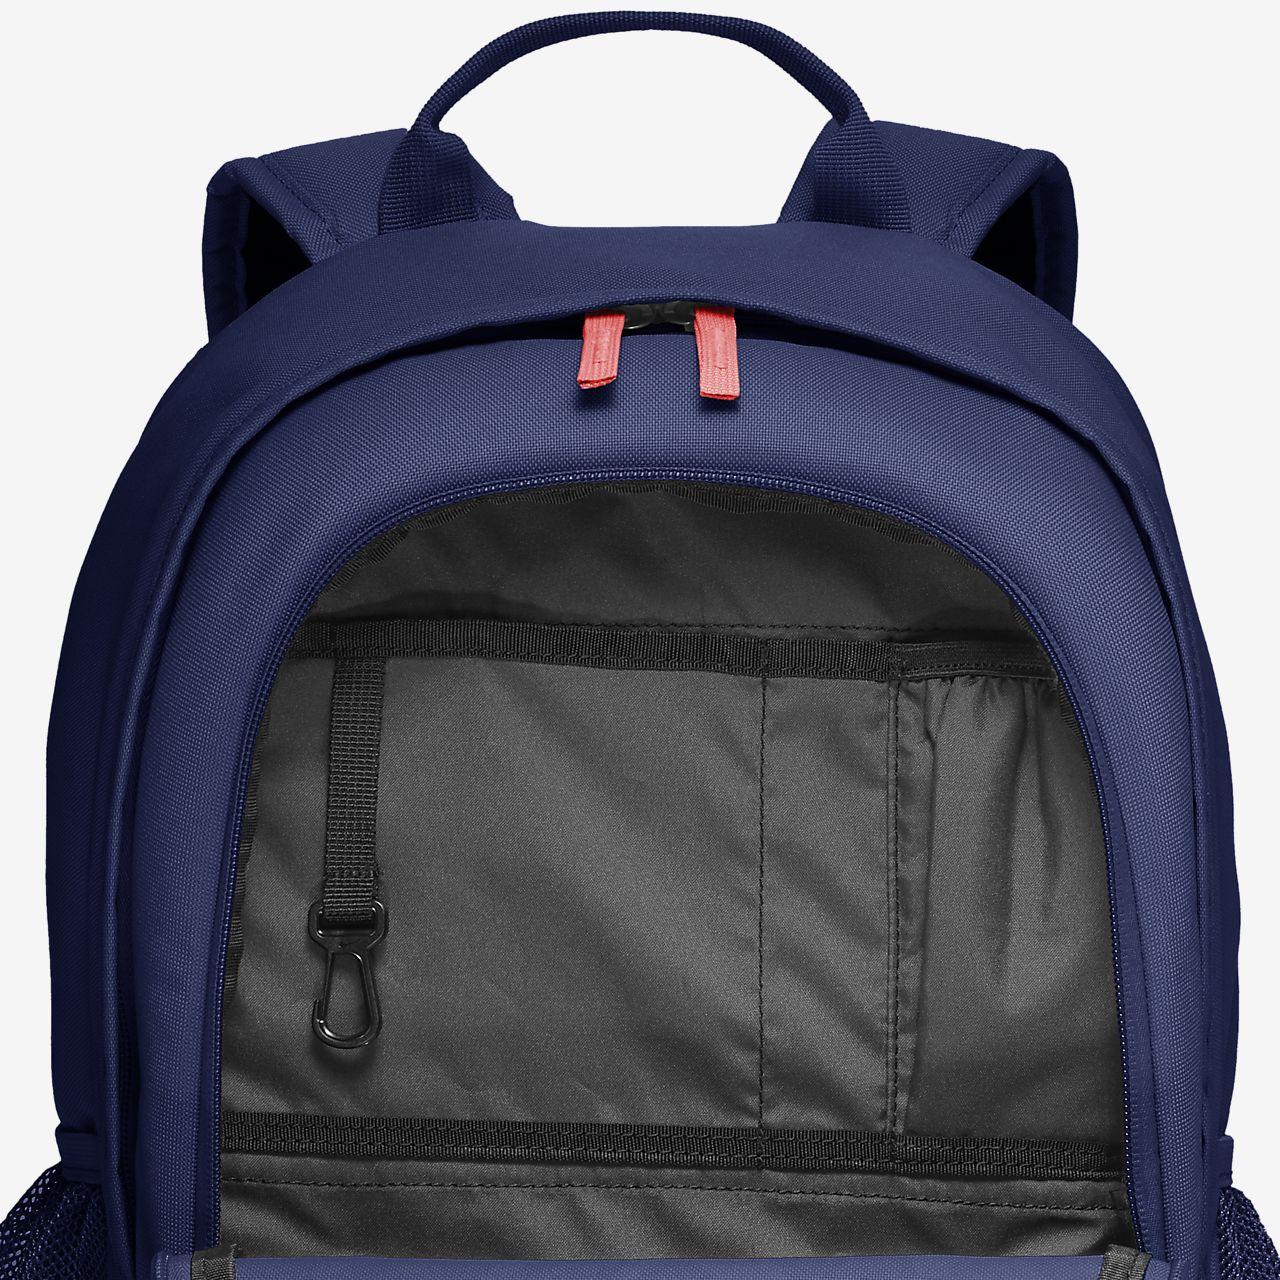 2538a31637 Nike Sportswear Hayward Futura 2.0 Backpack. Nike.com CA